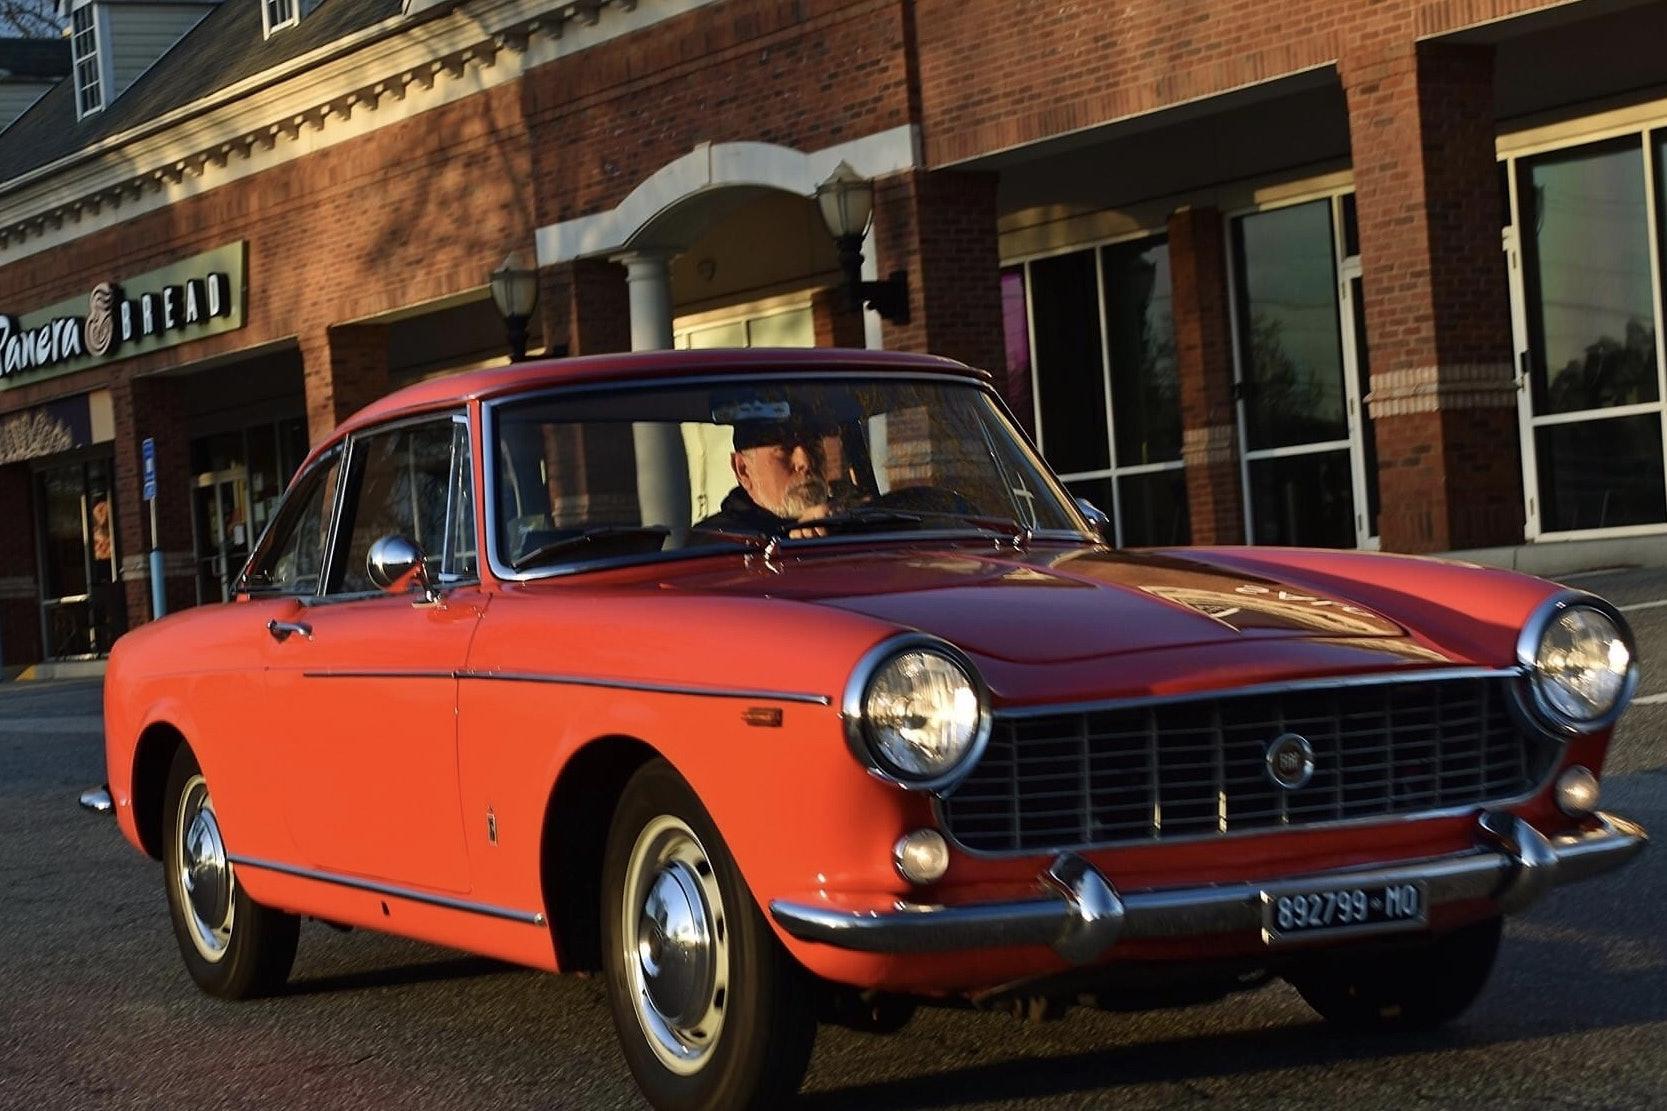 1966 Fiat Coupe Pininfarina